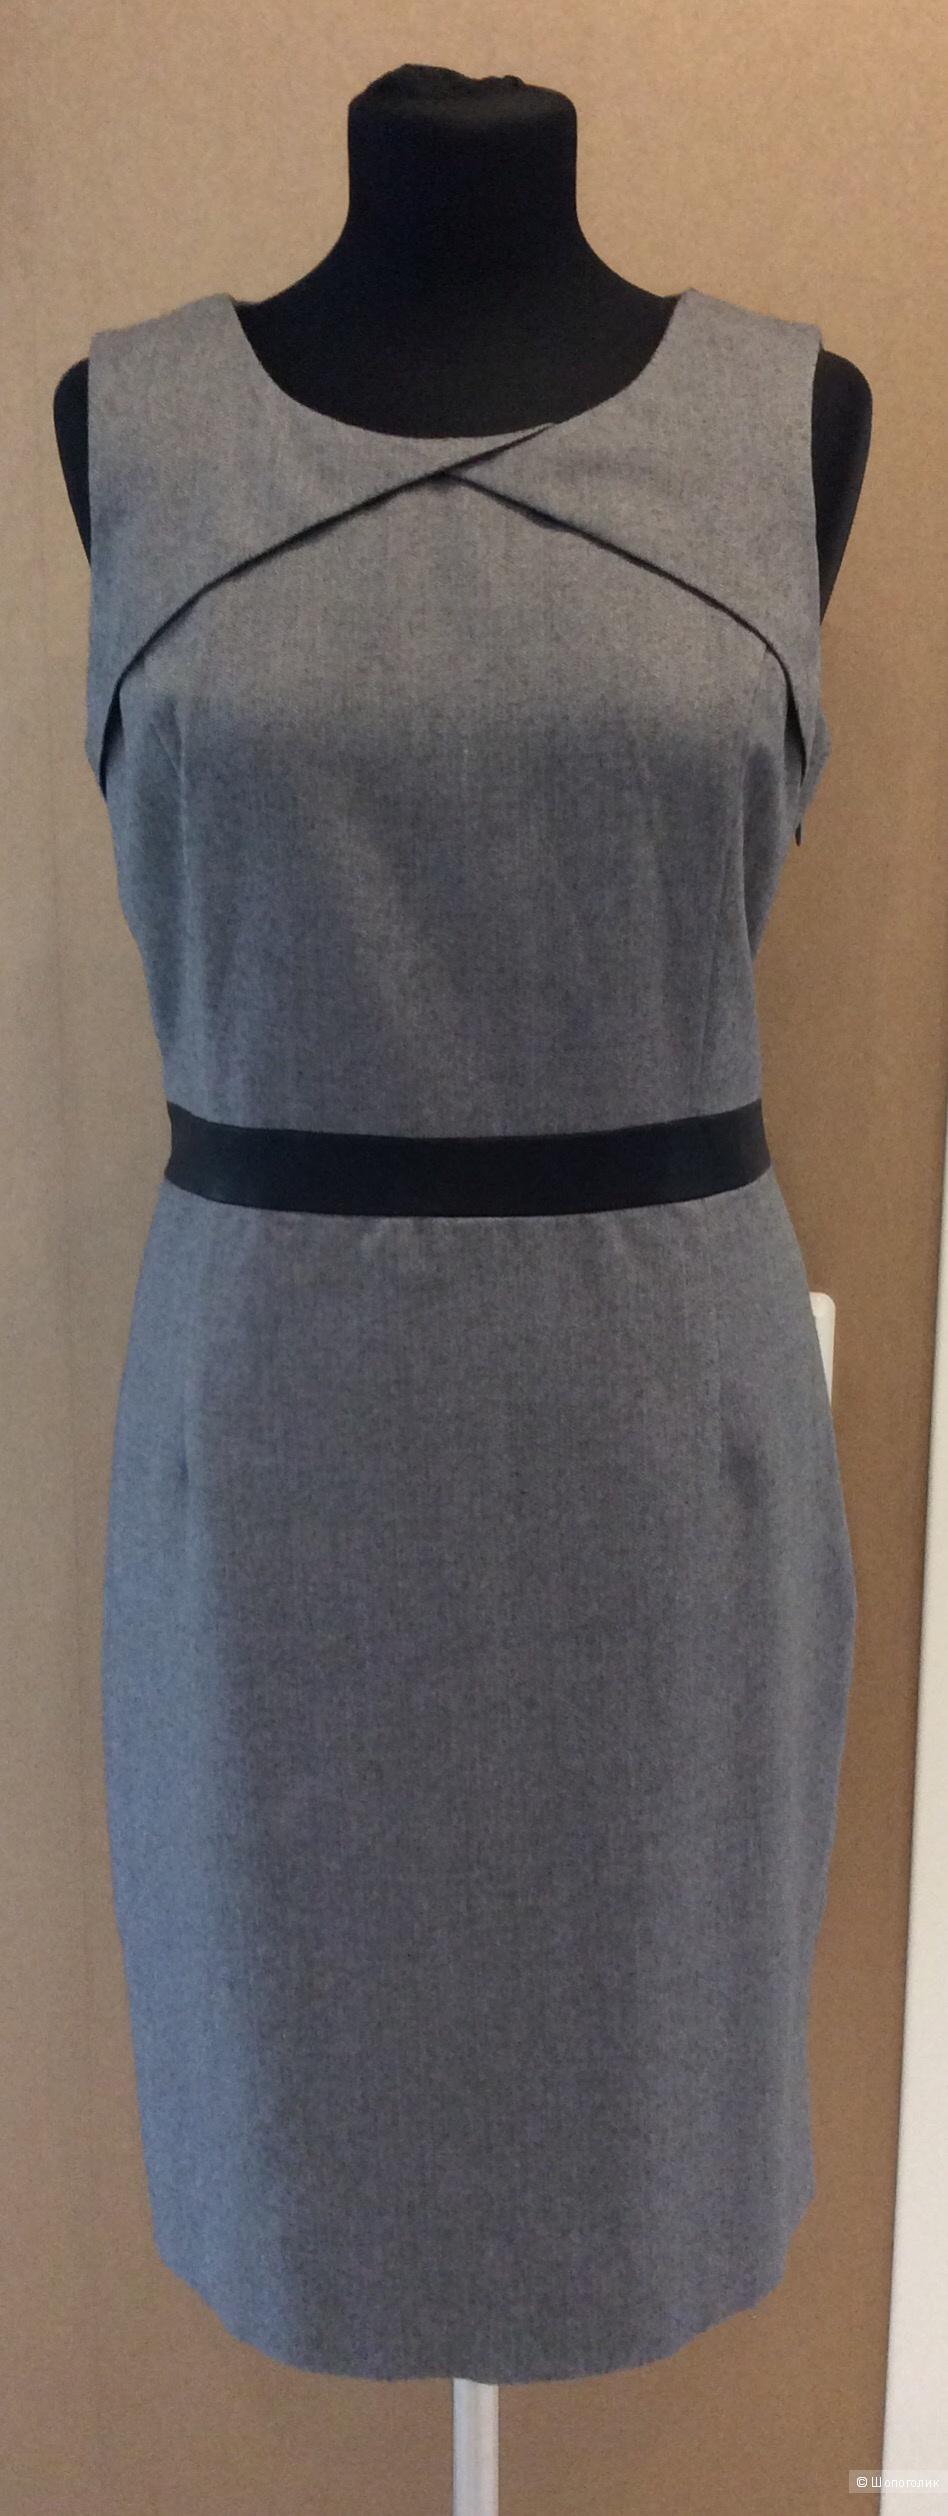 Платье MEXX р.42 (на 48-50)